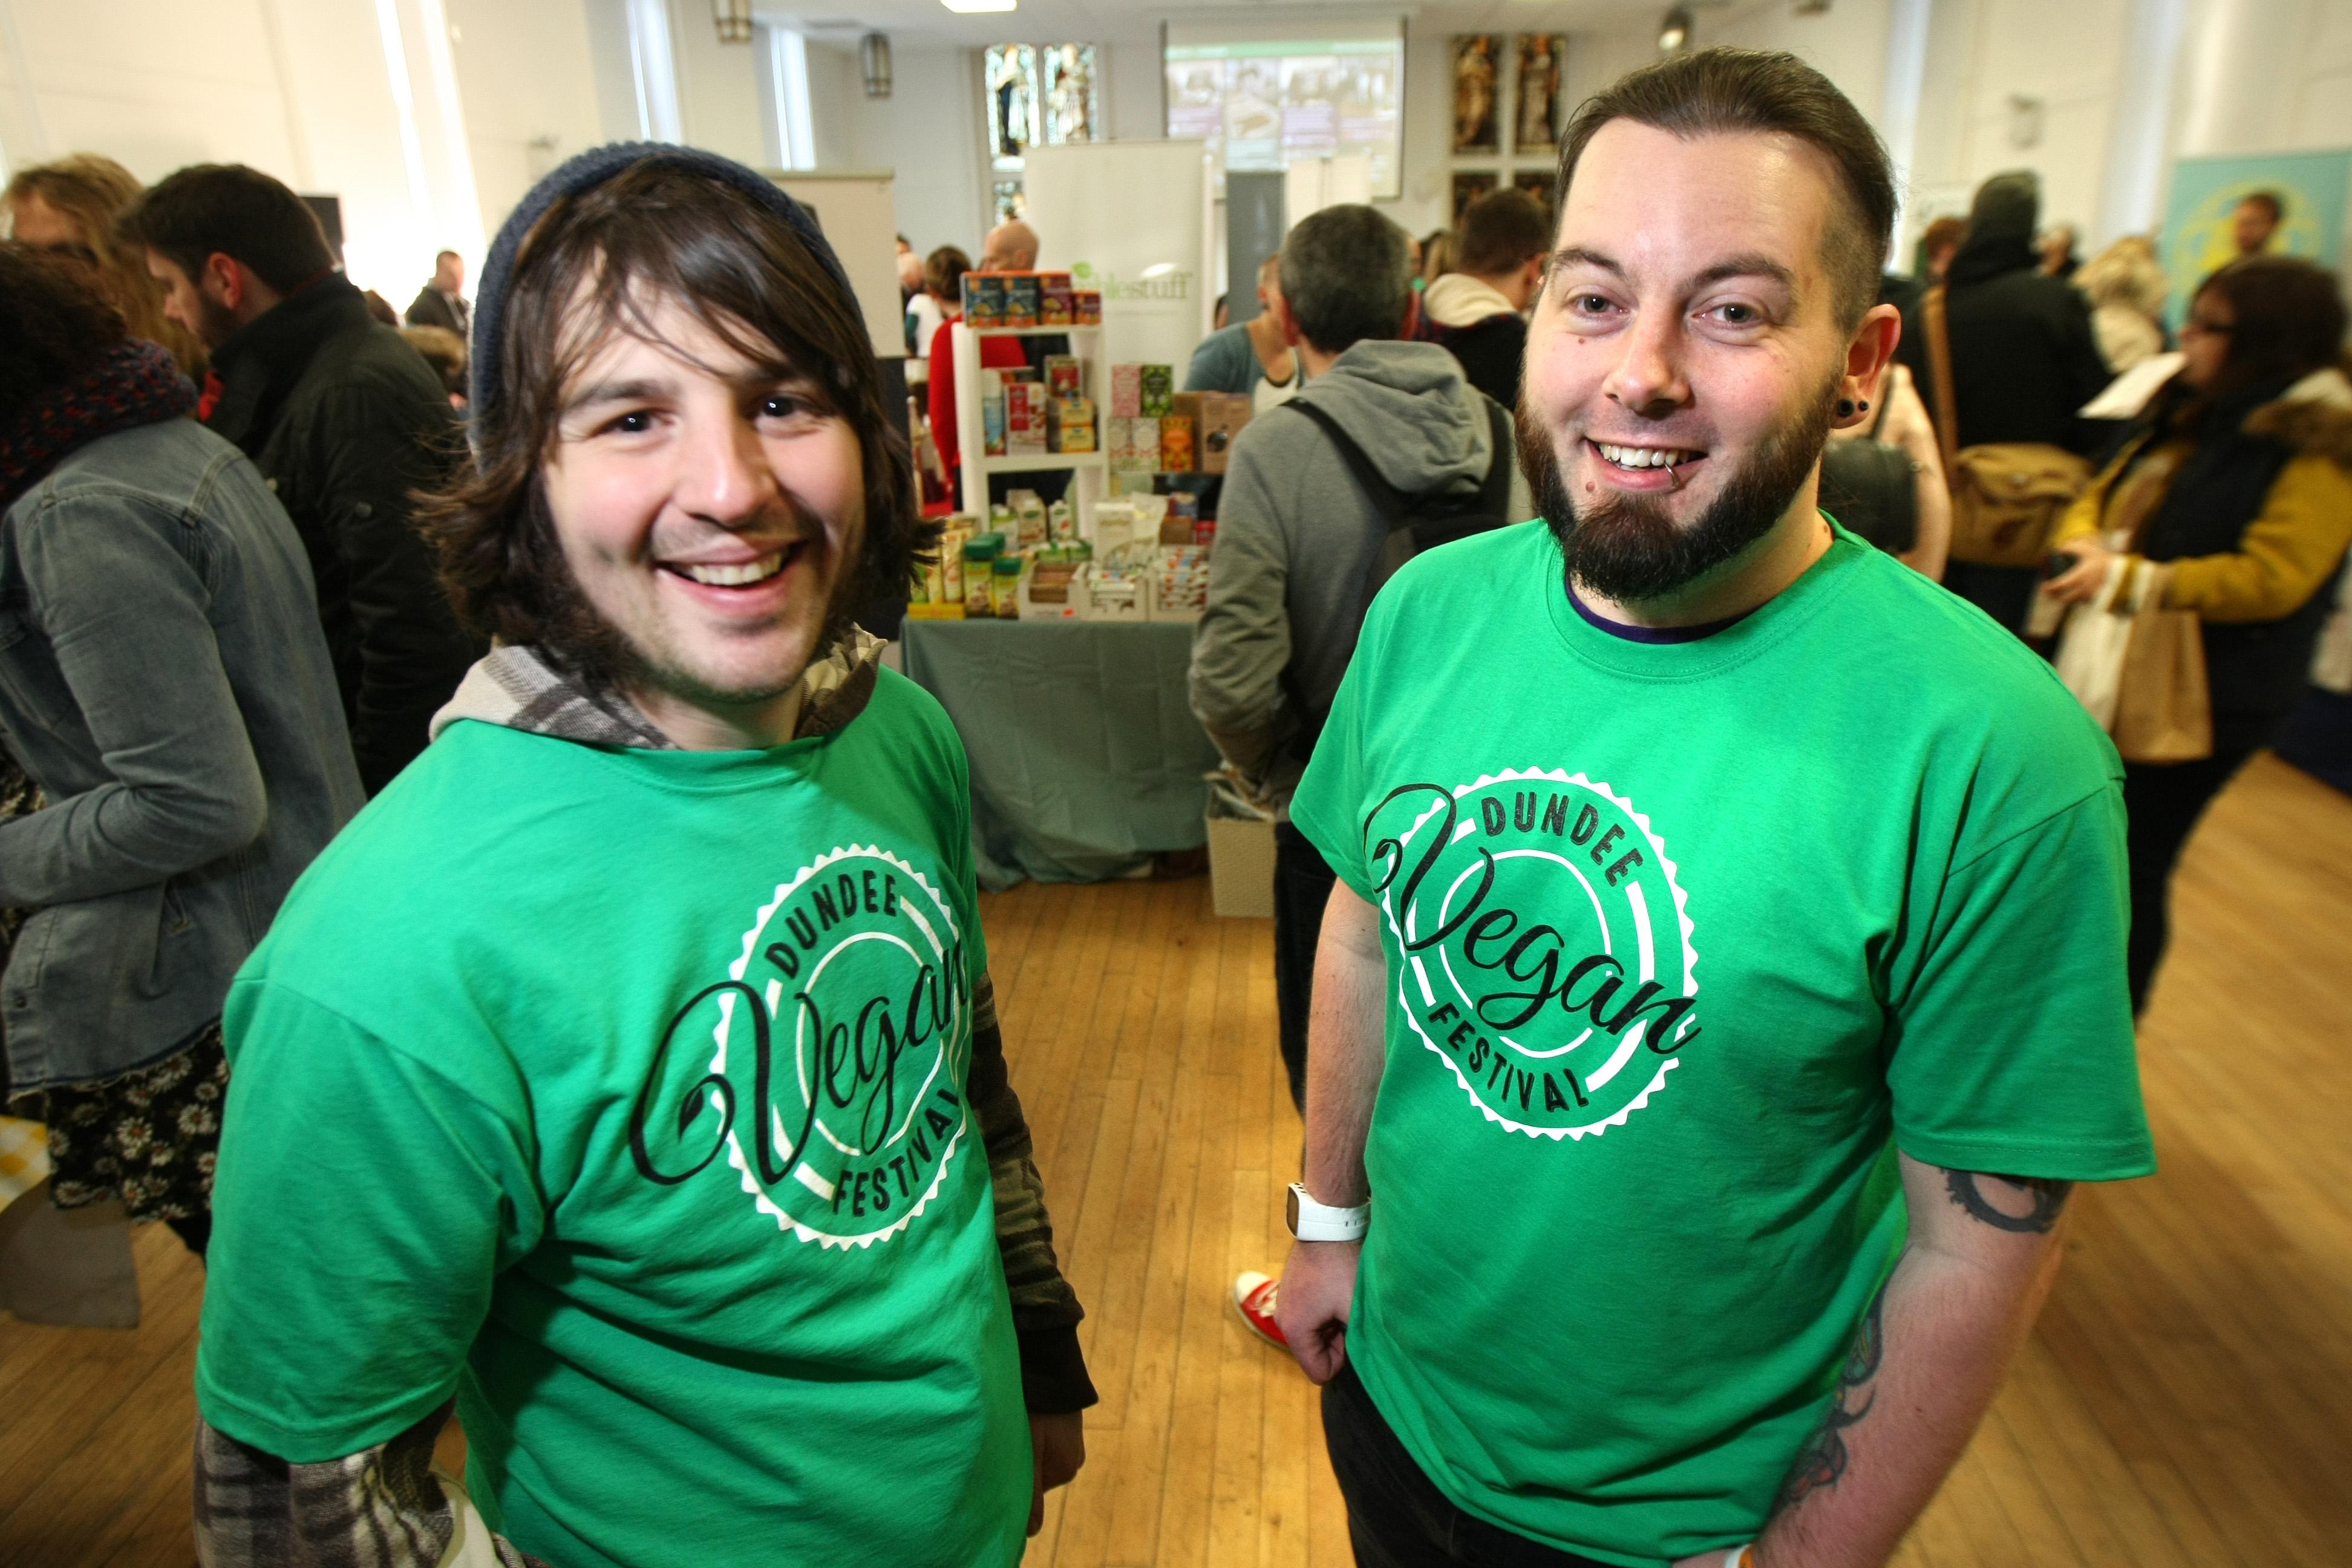 Jamie Kidd and Barry Mackie-Conlon at the 2016 vegan festival.